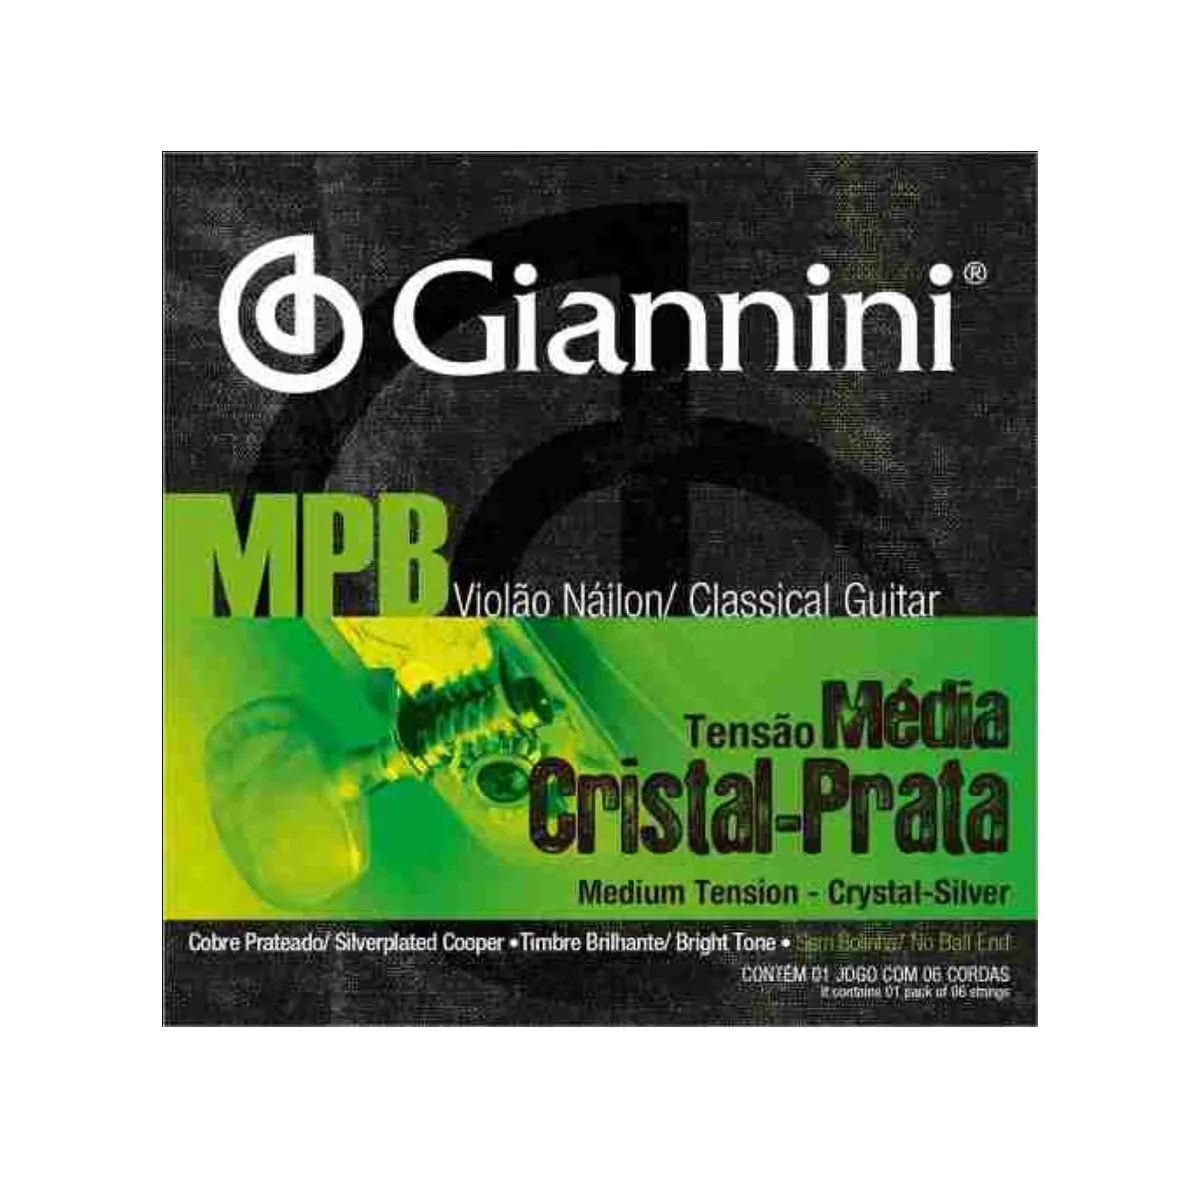 Encordoamento Giannini Genws MPB Tensão Média Violão Nylon